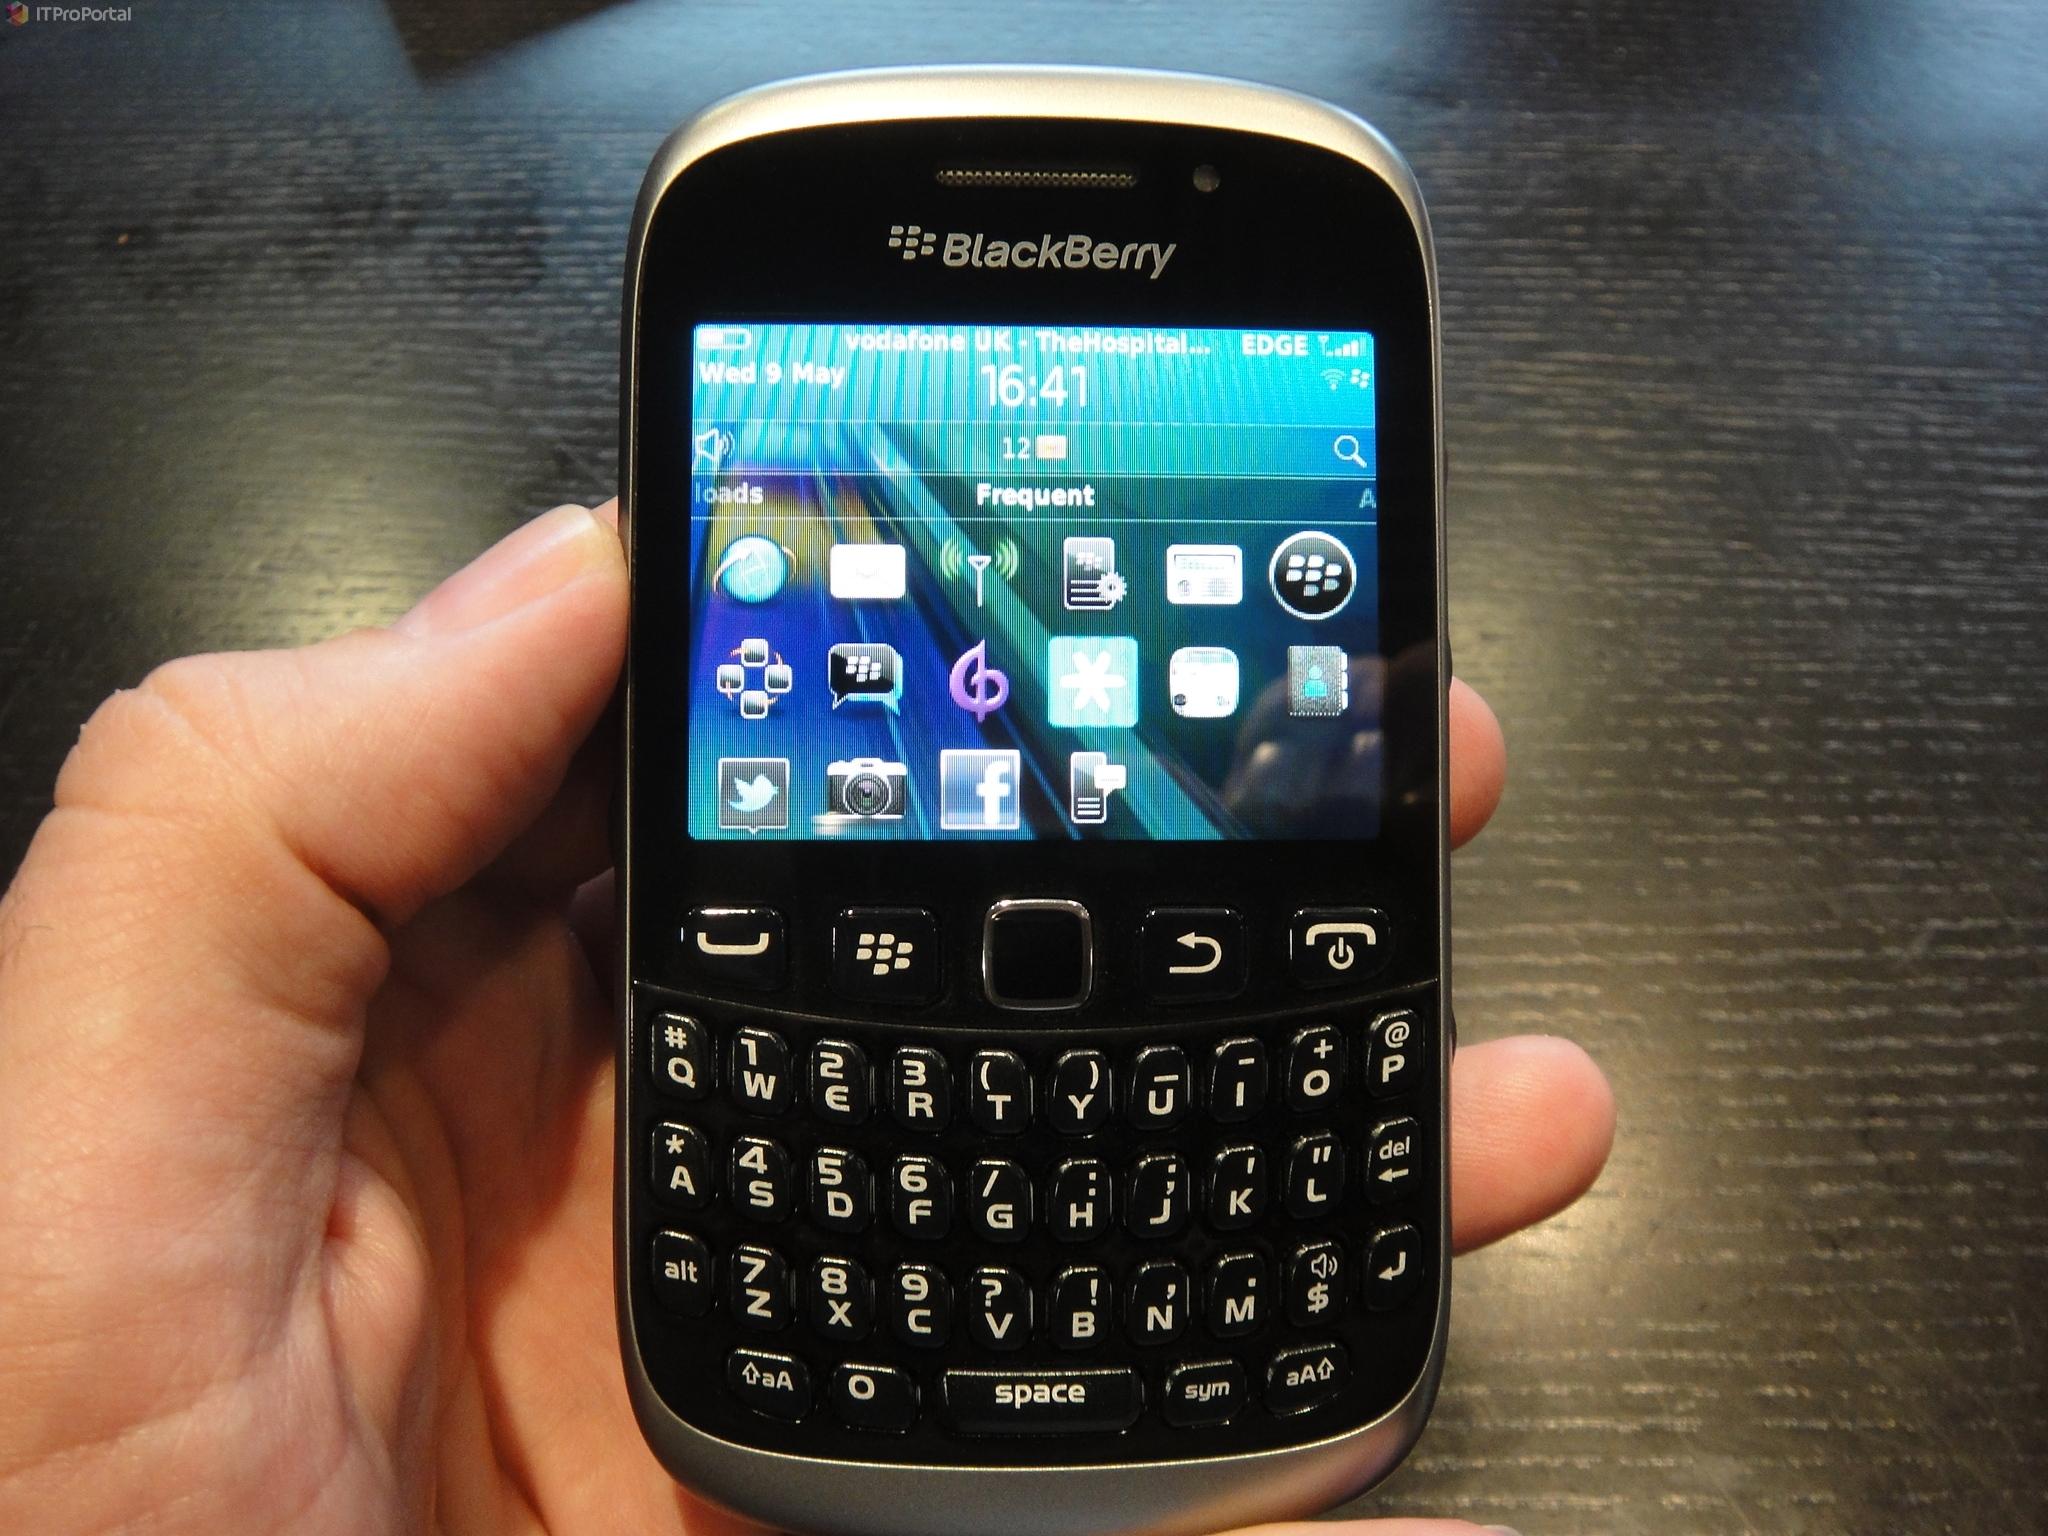 Blackberry Curve 9320 Black And Silver شكل مميز بجو...